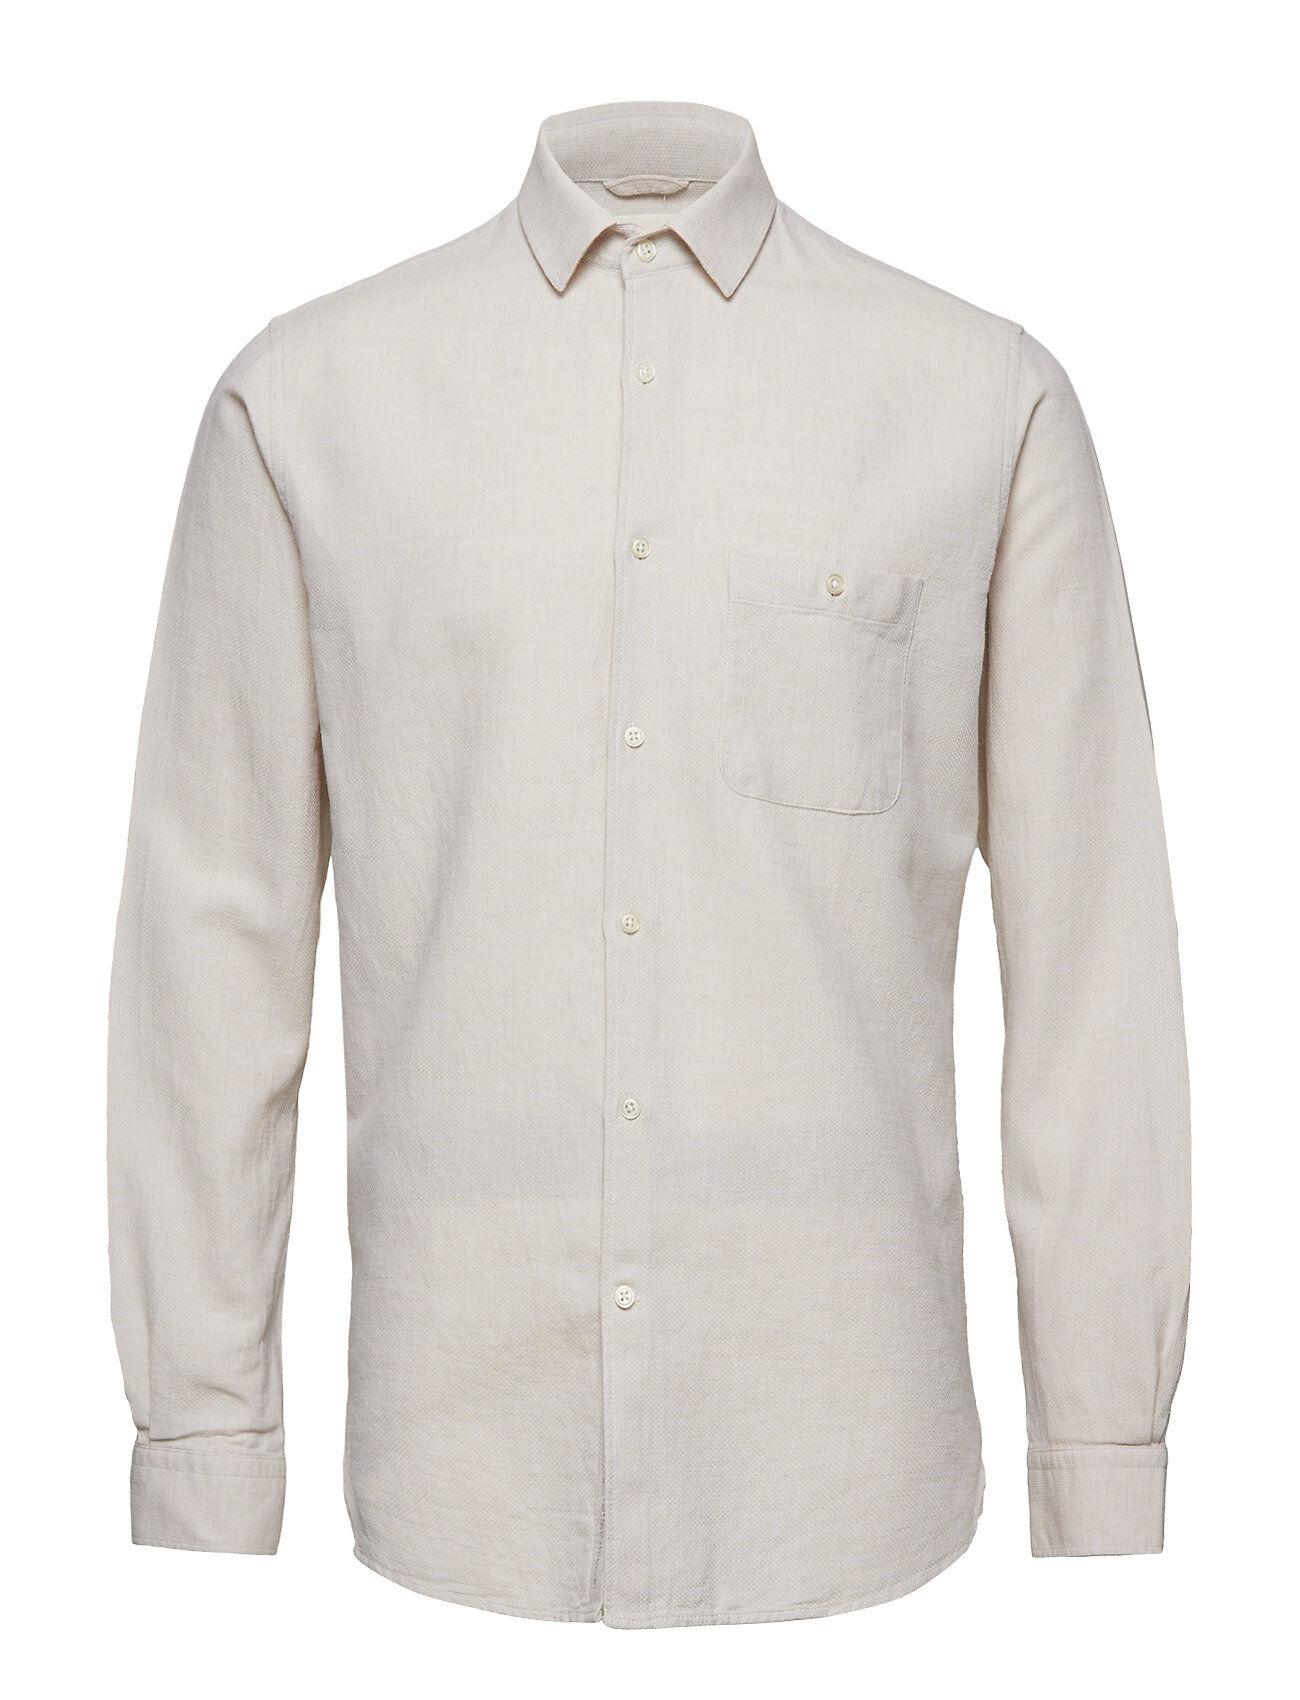 Knowledge Cotton Apparel Structured Shirt - Gots/Vegan